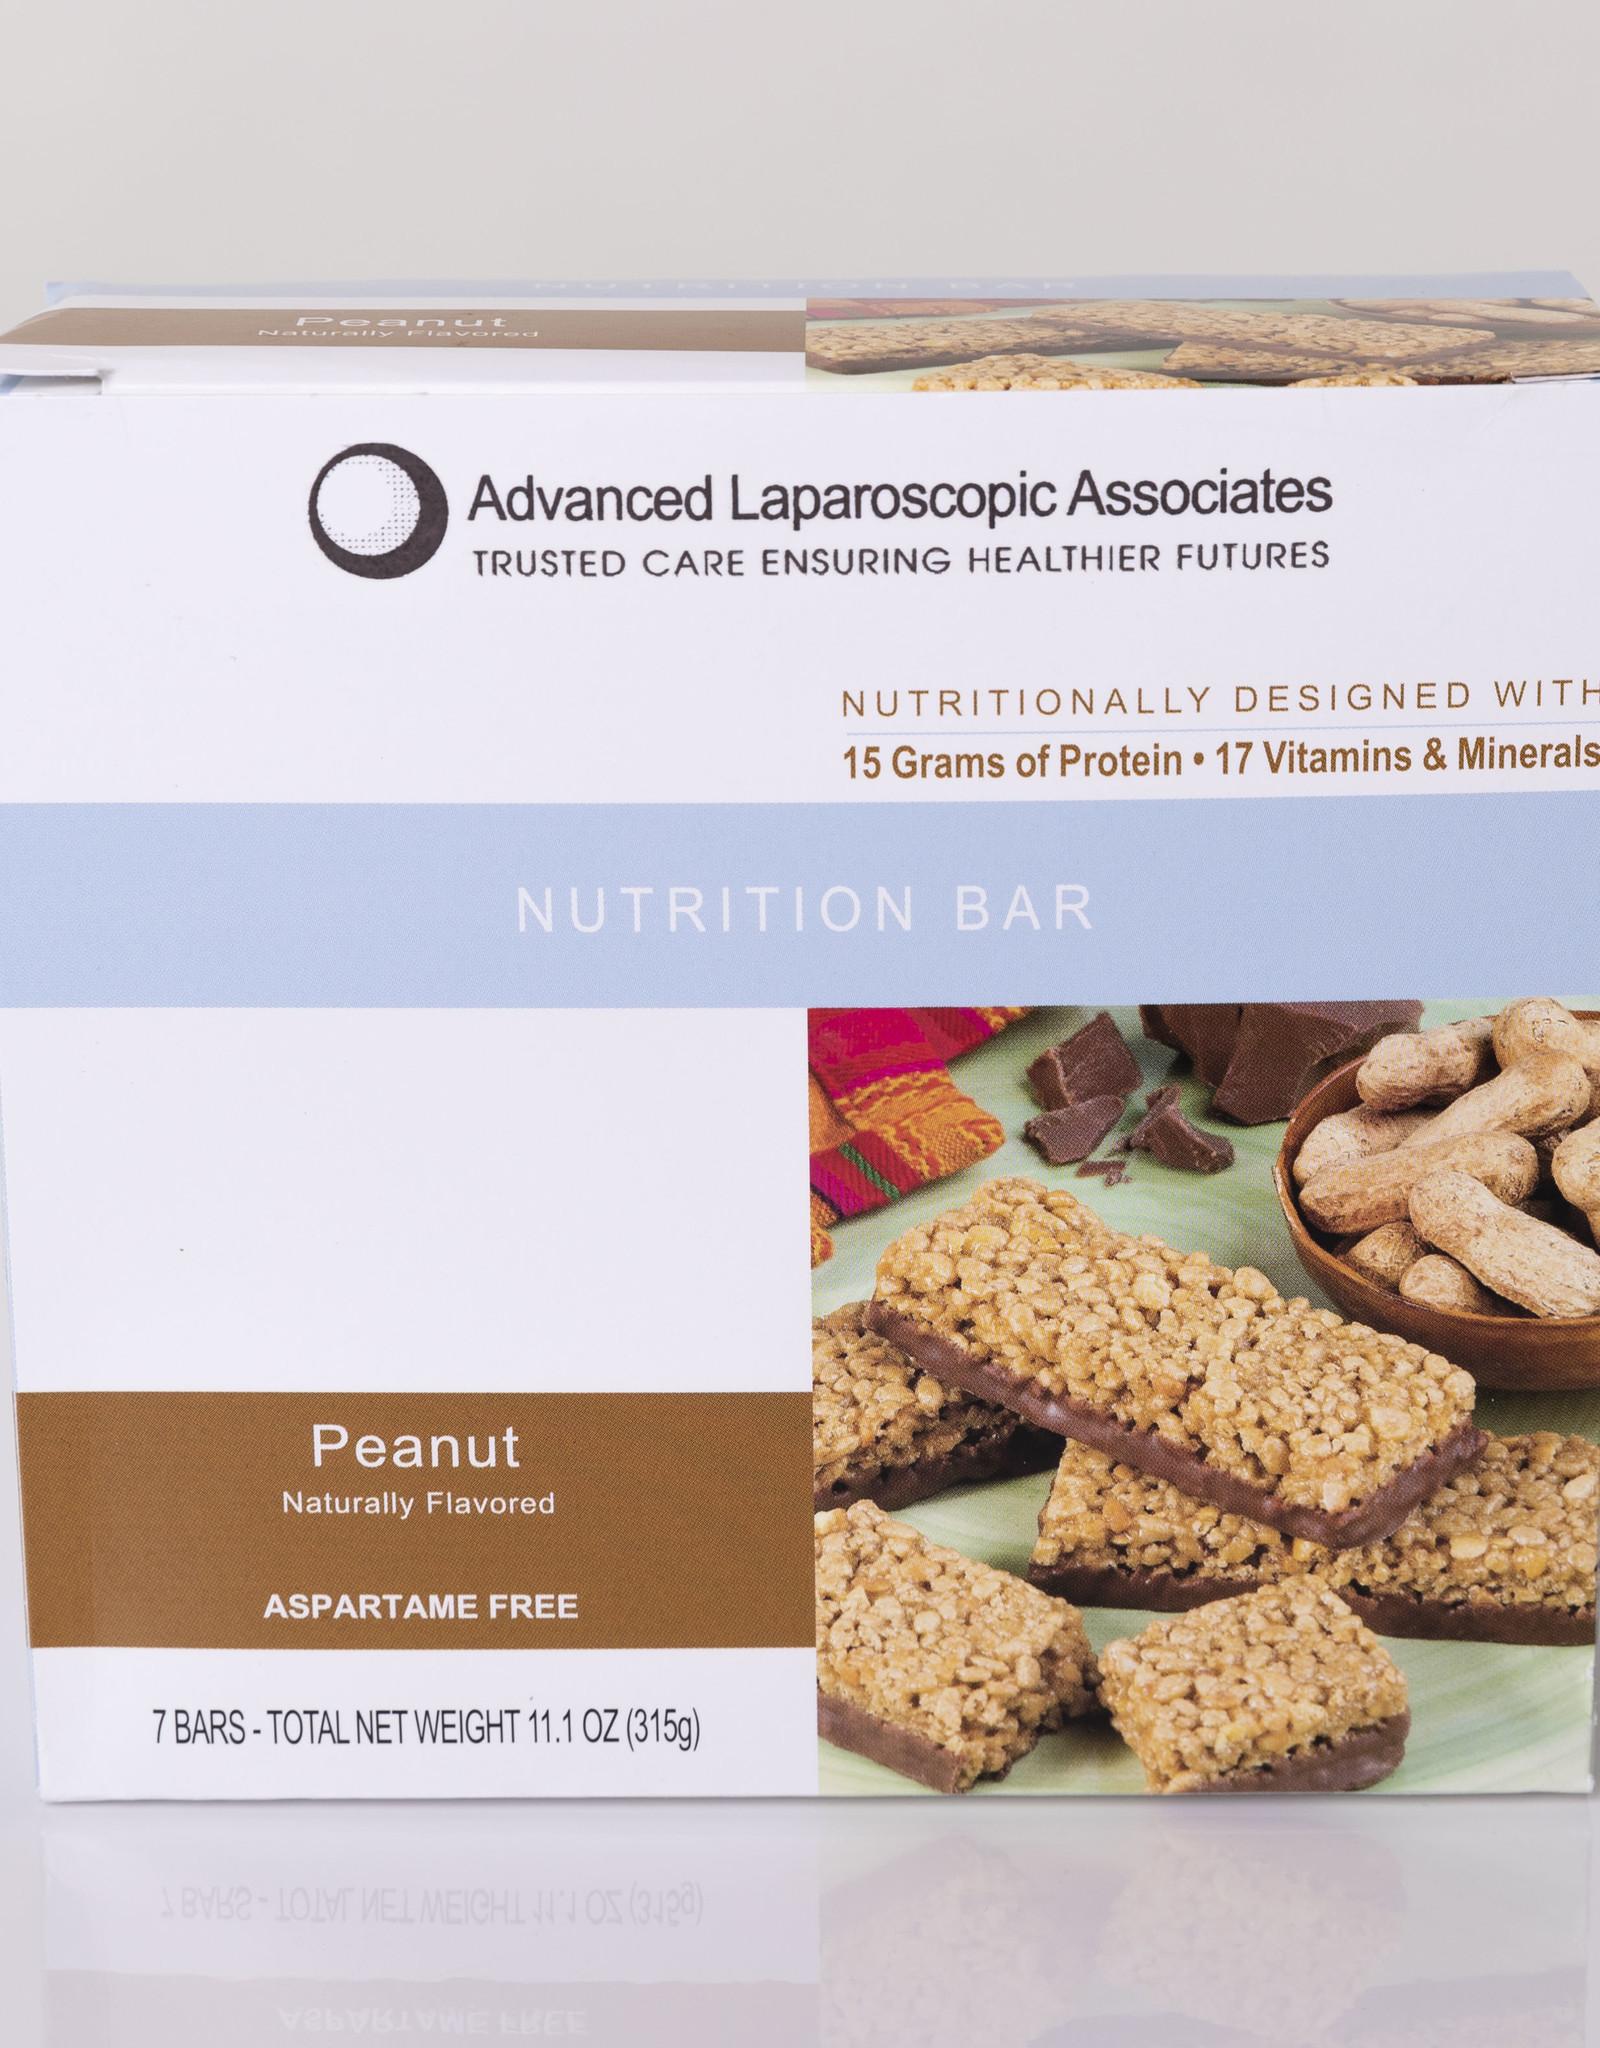 Advanced Laparoscopic Associates Peanut Bar